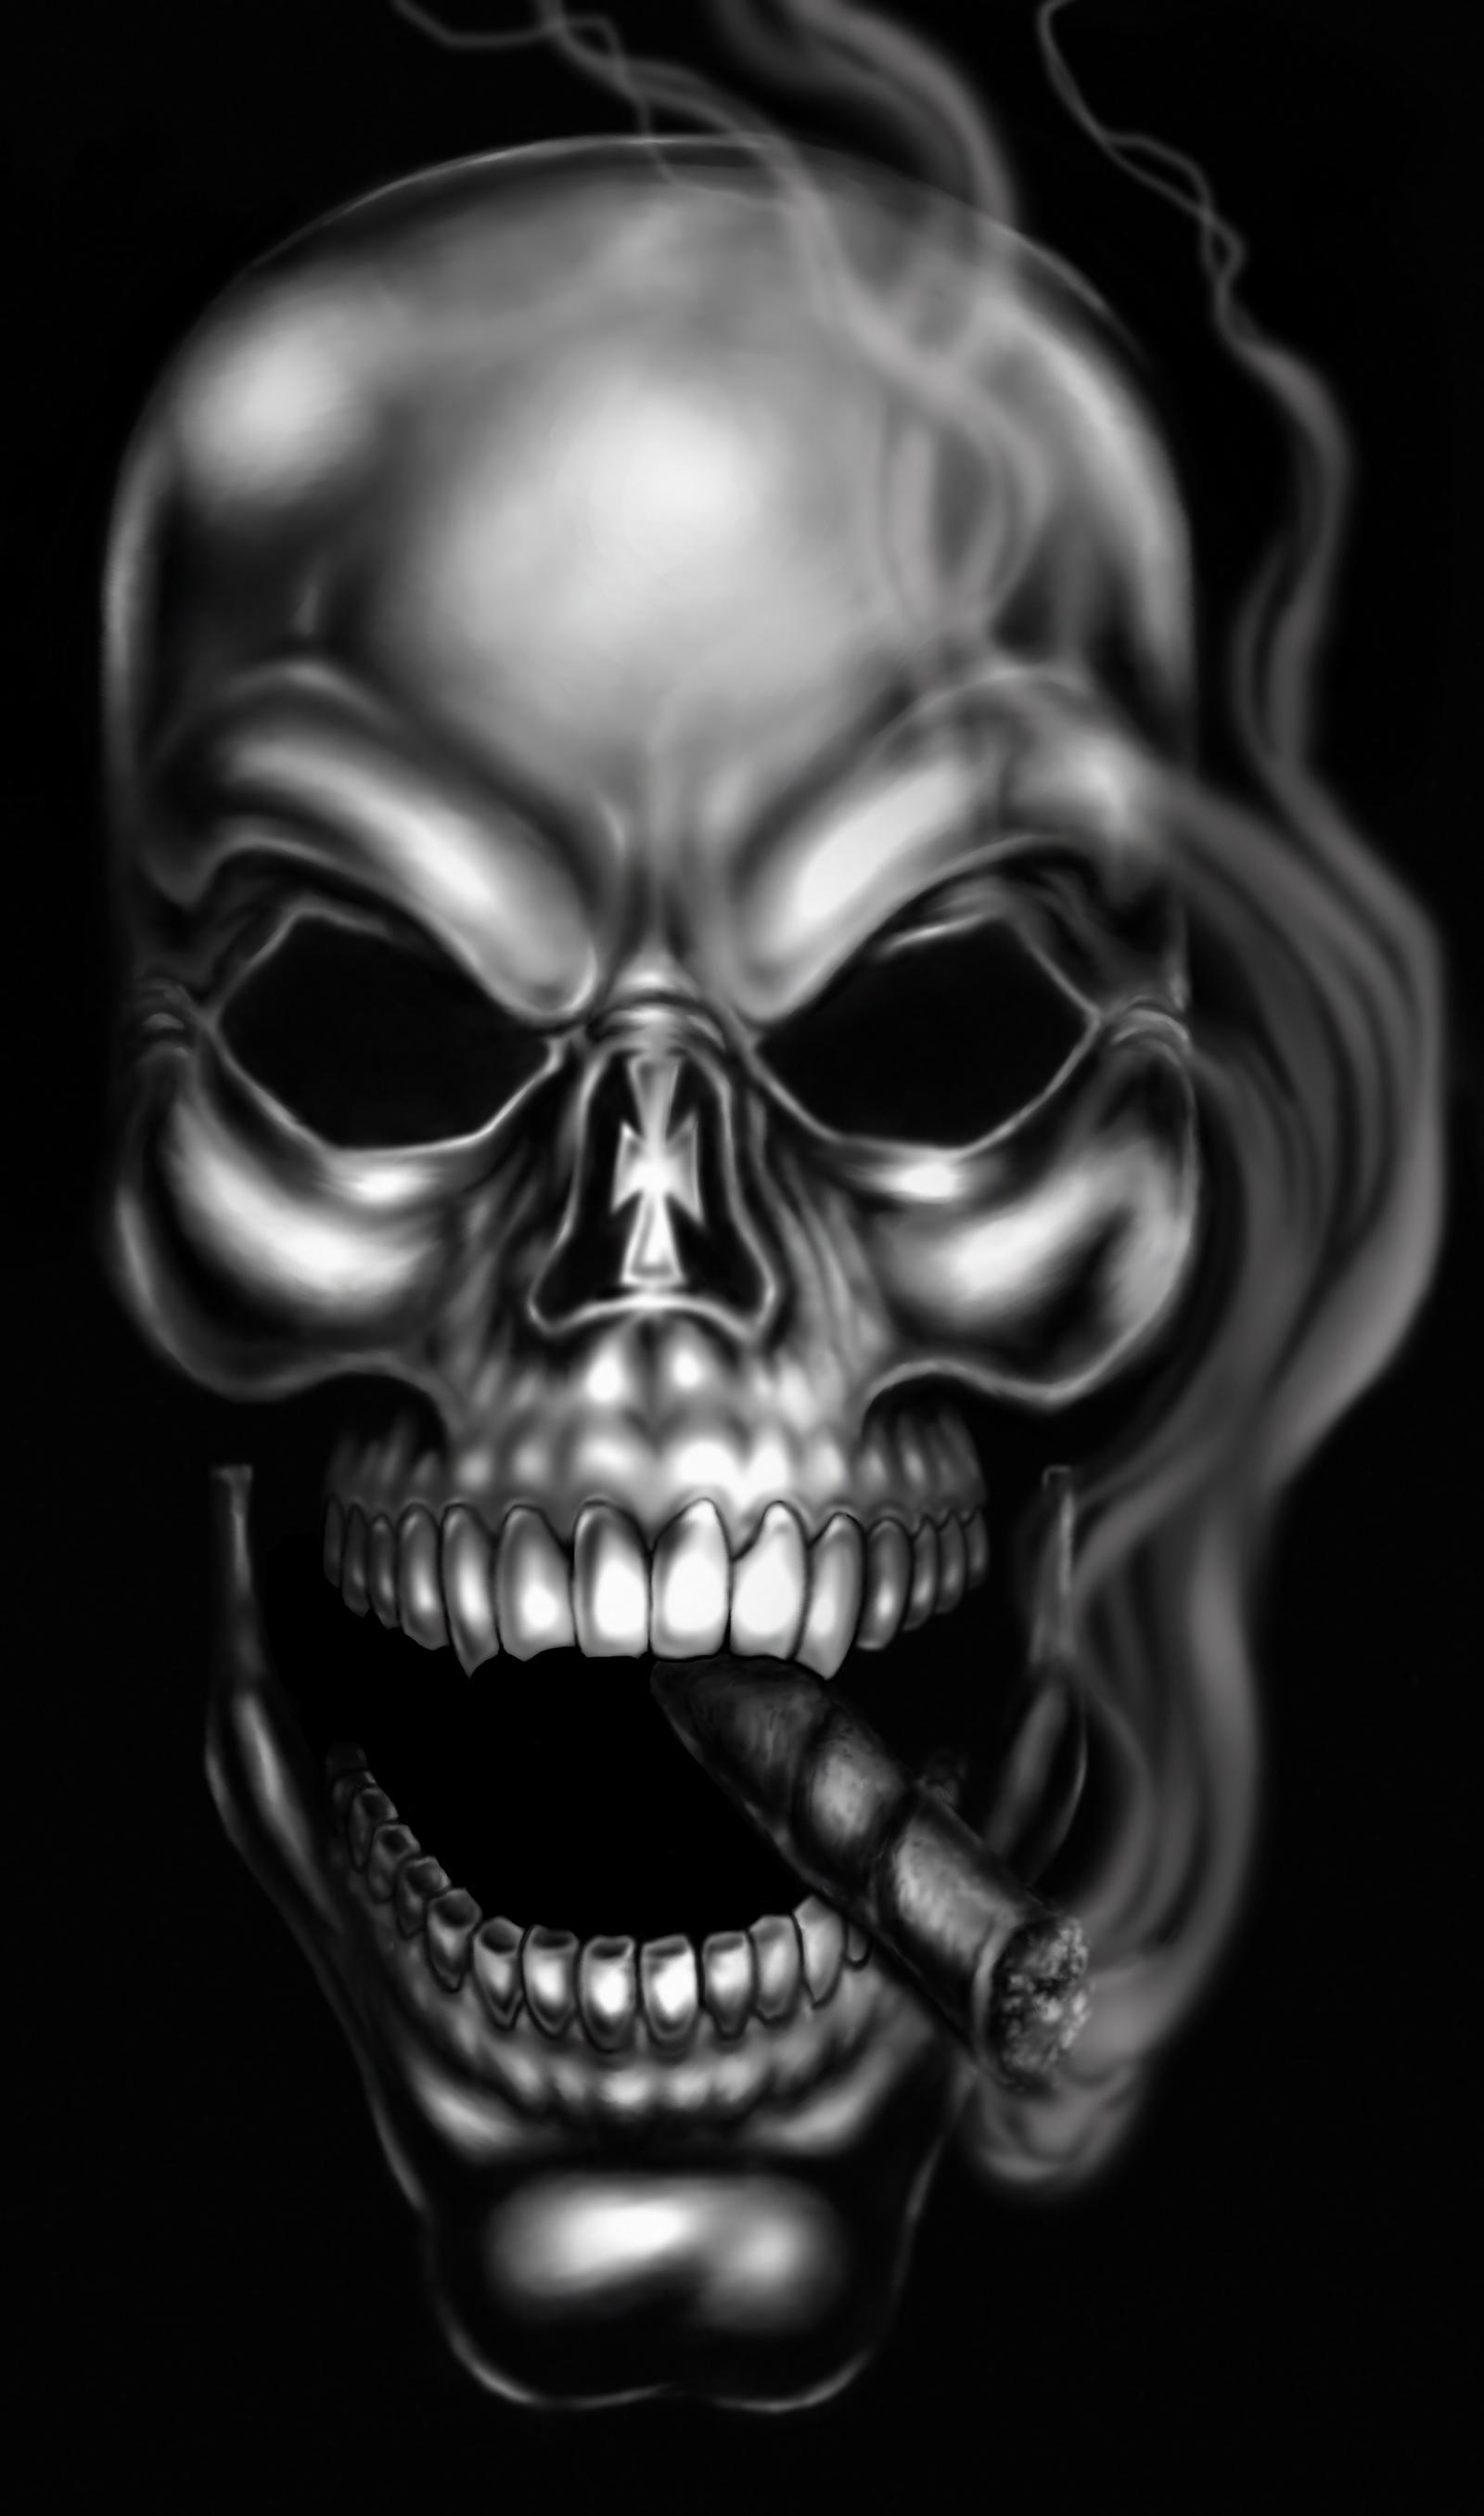 Smoking Skull by RAM by robertmarzullo on DeviantArt